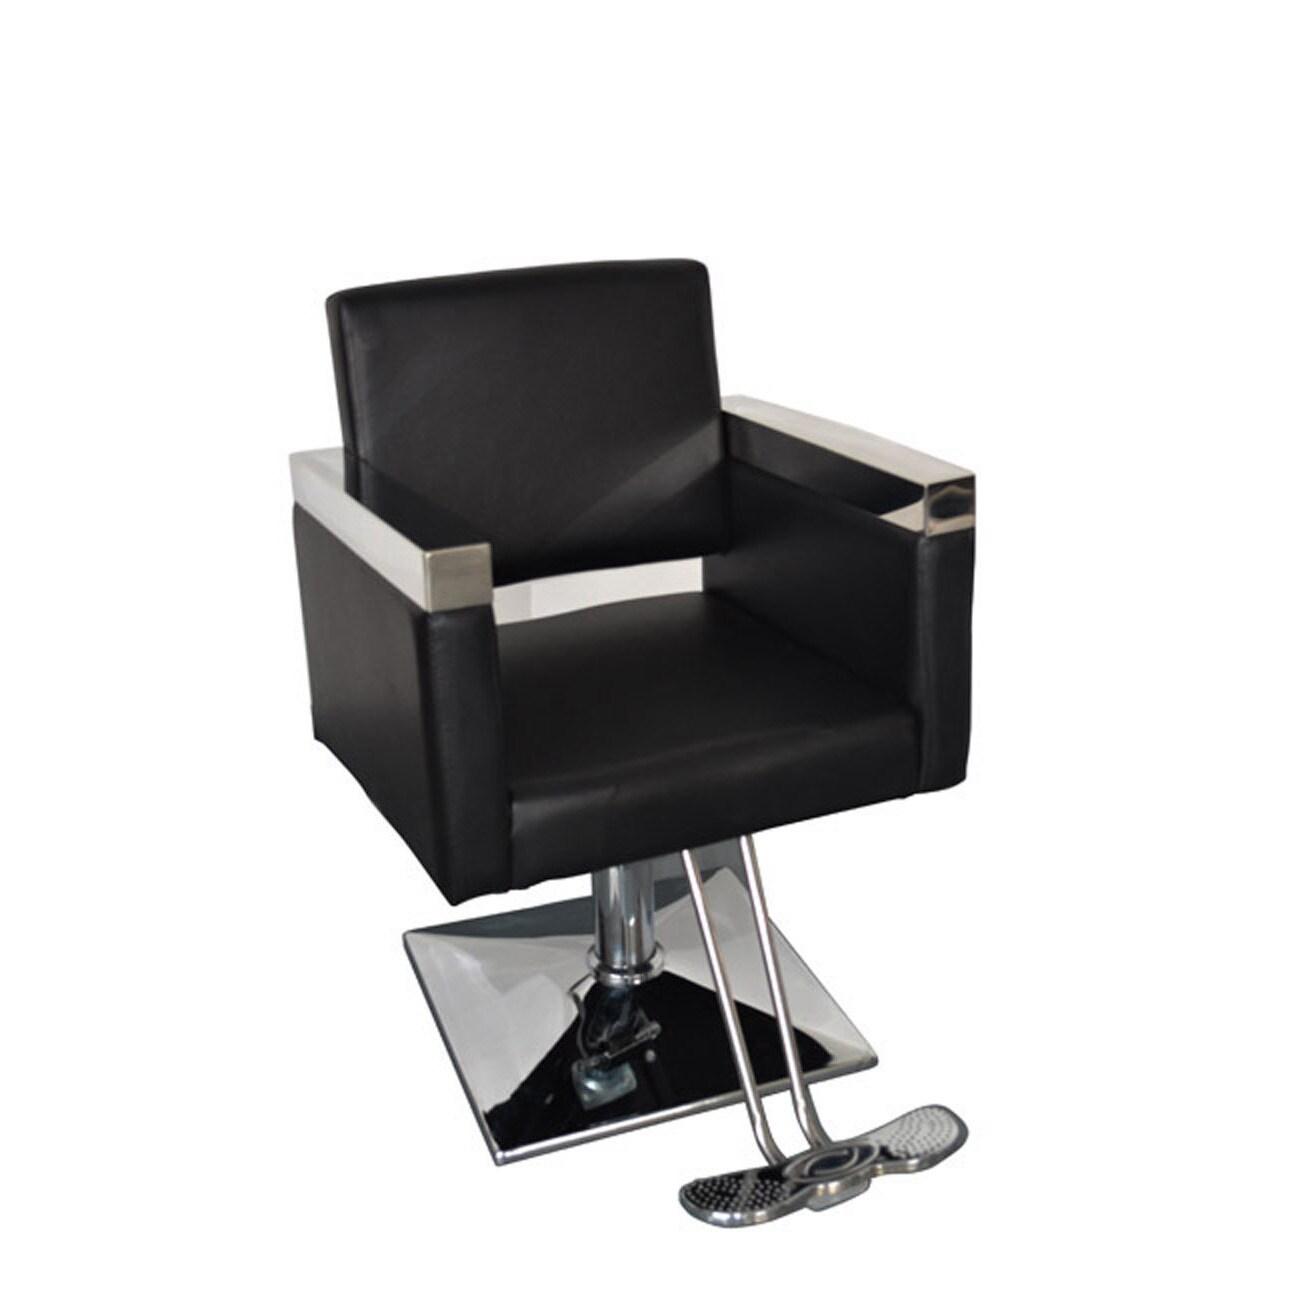 BarberPub Hydraulic Black Hair Salon Chair (Black)